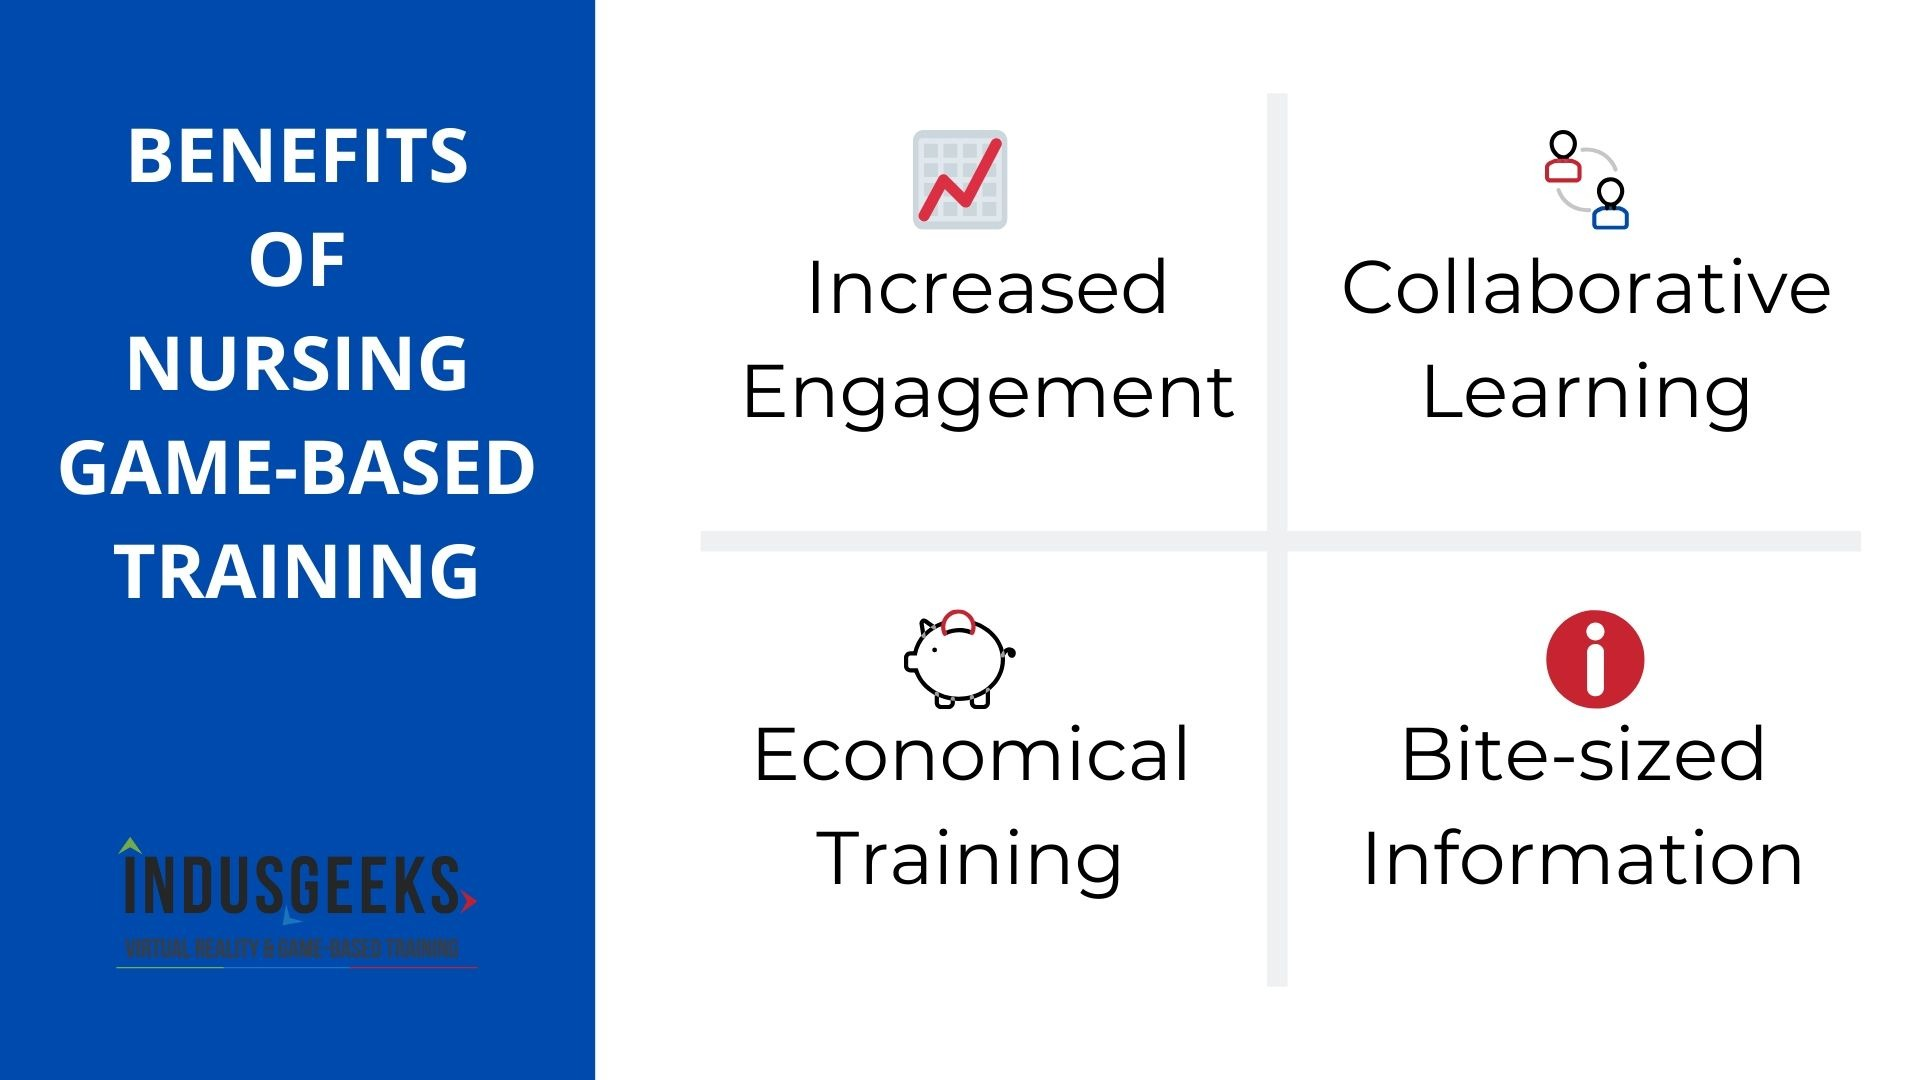 Benefits of nursing training